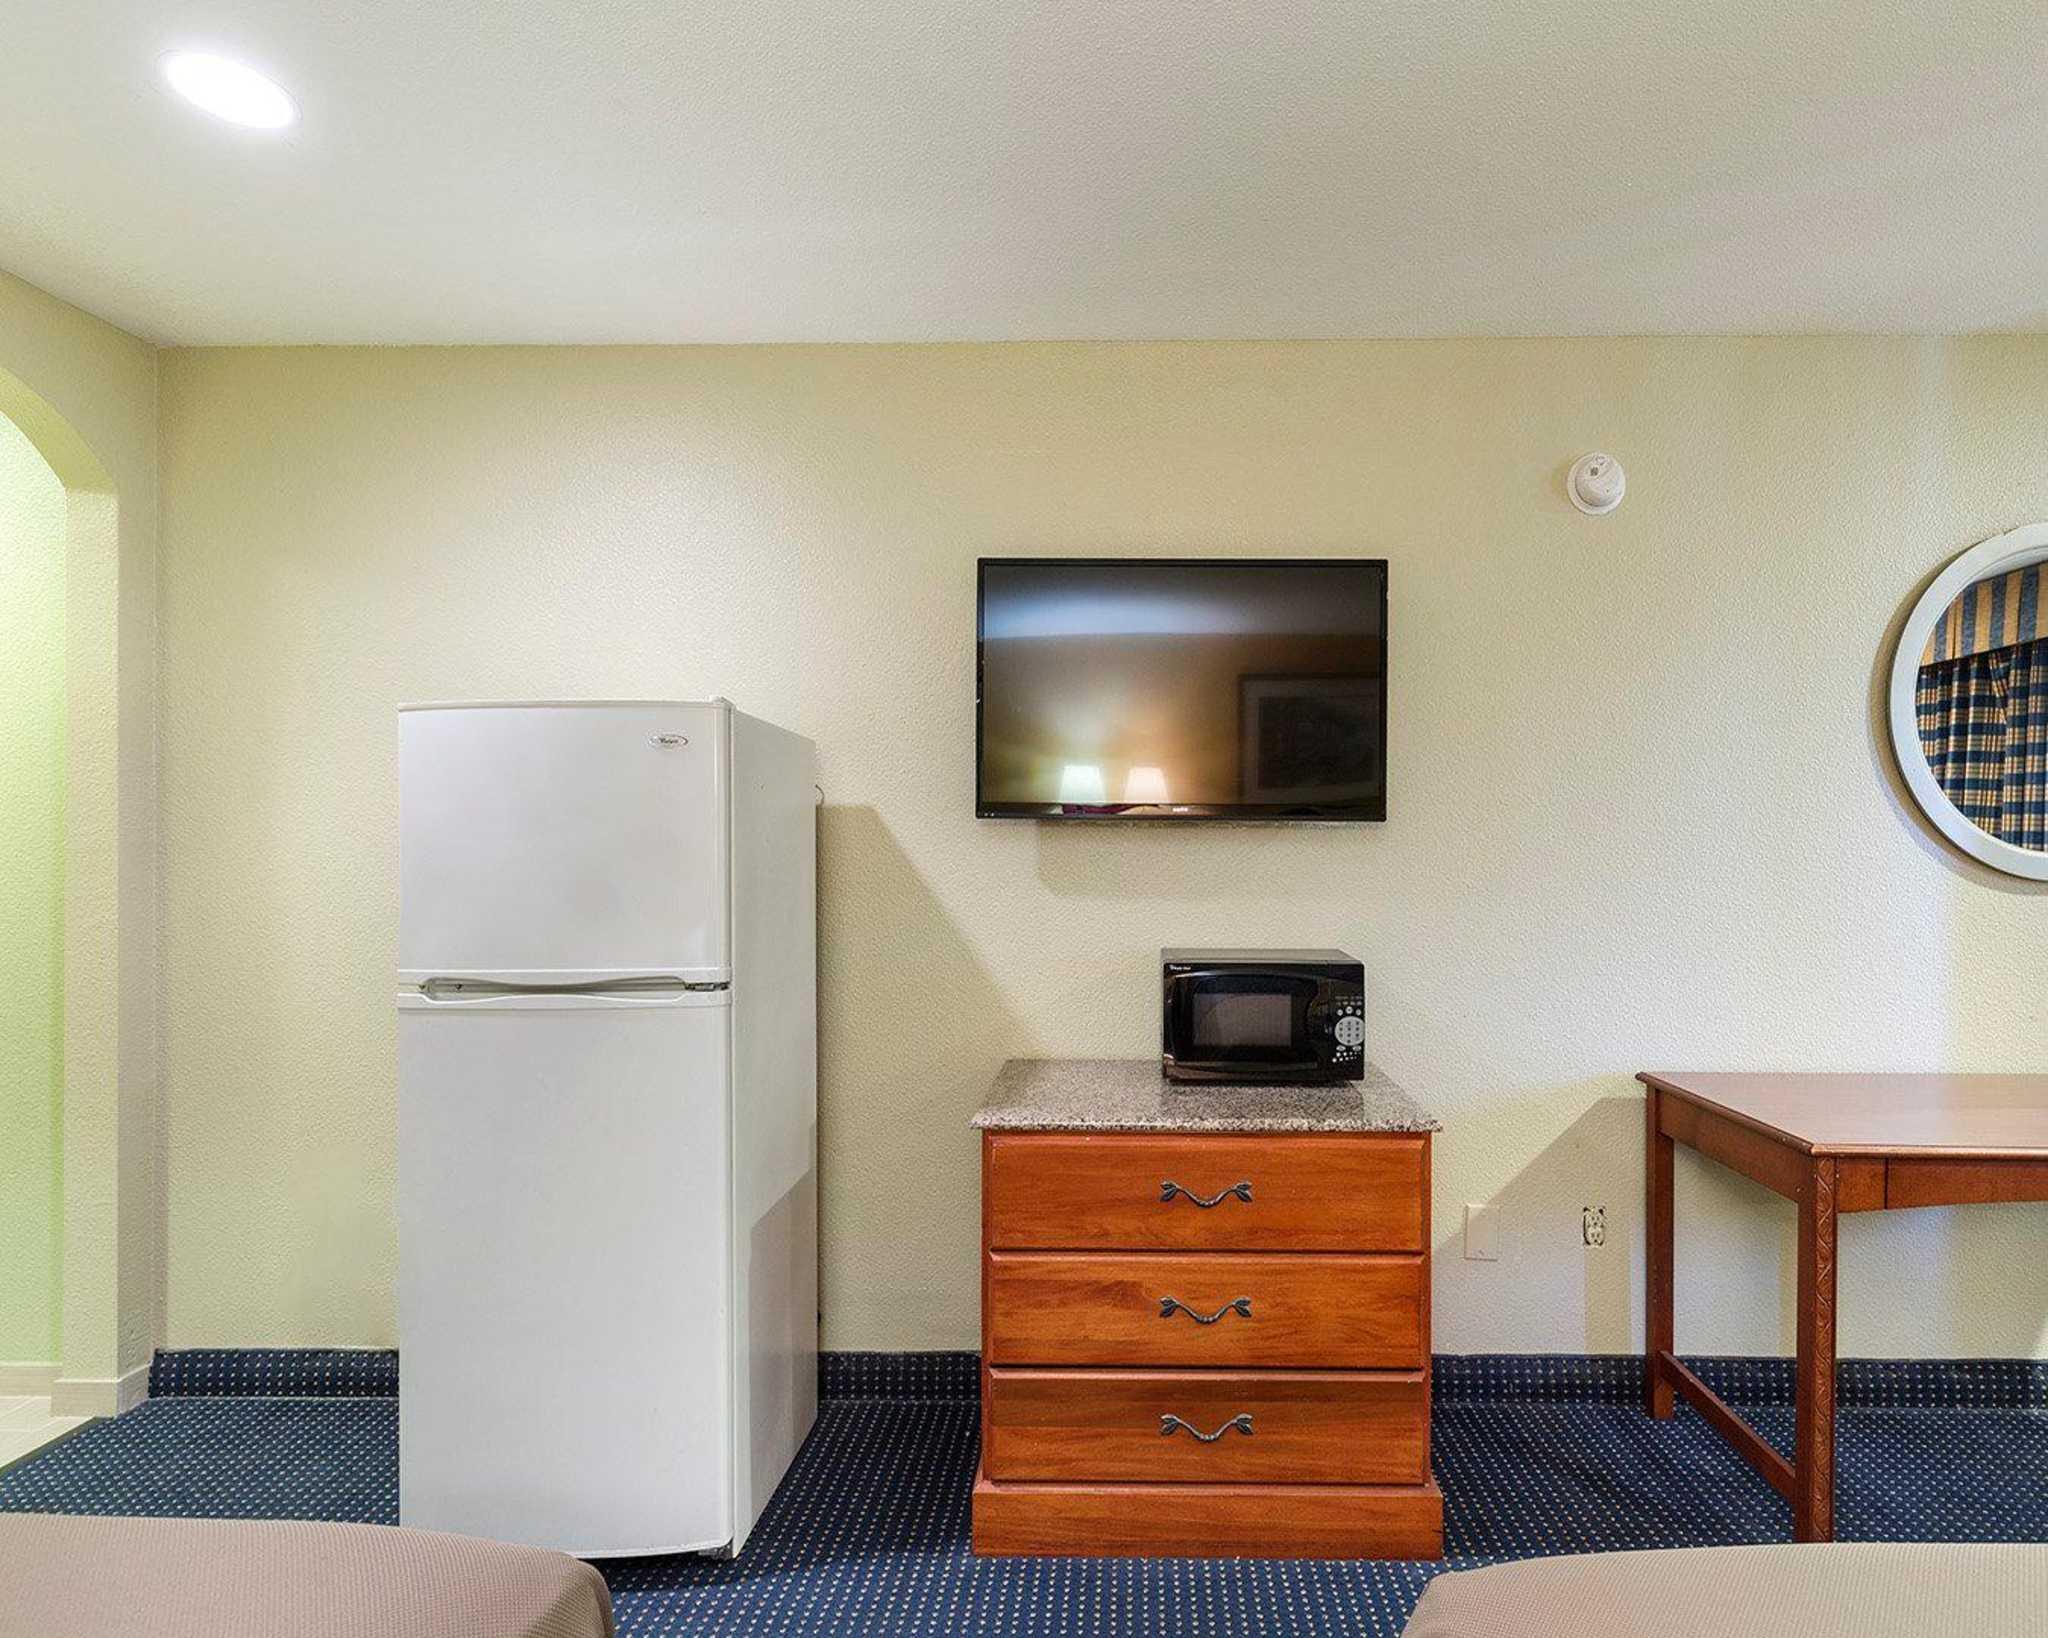 Rodeway Inn image 15